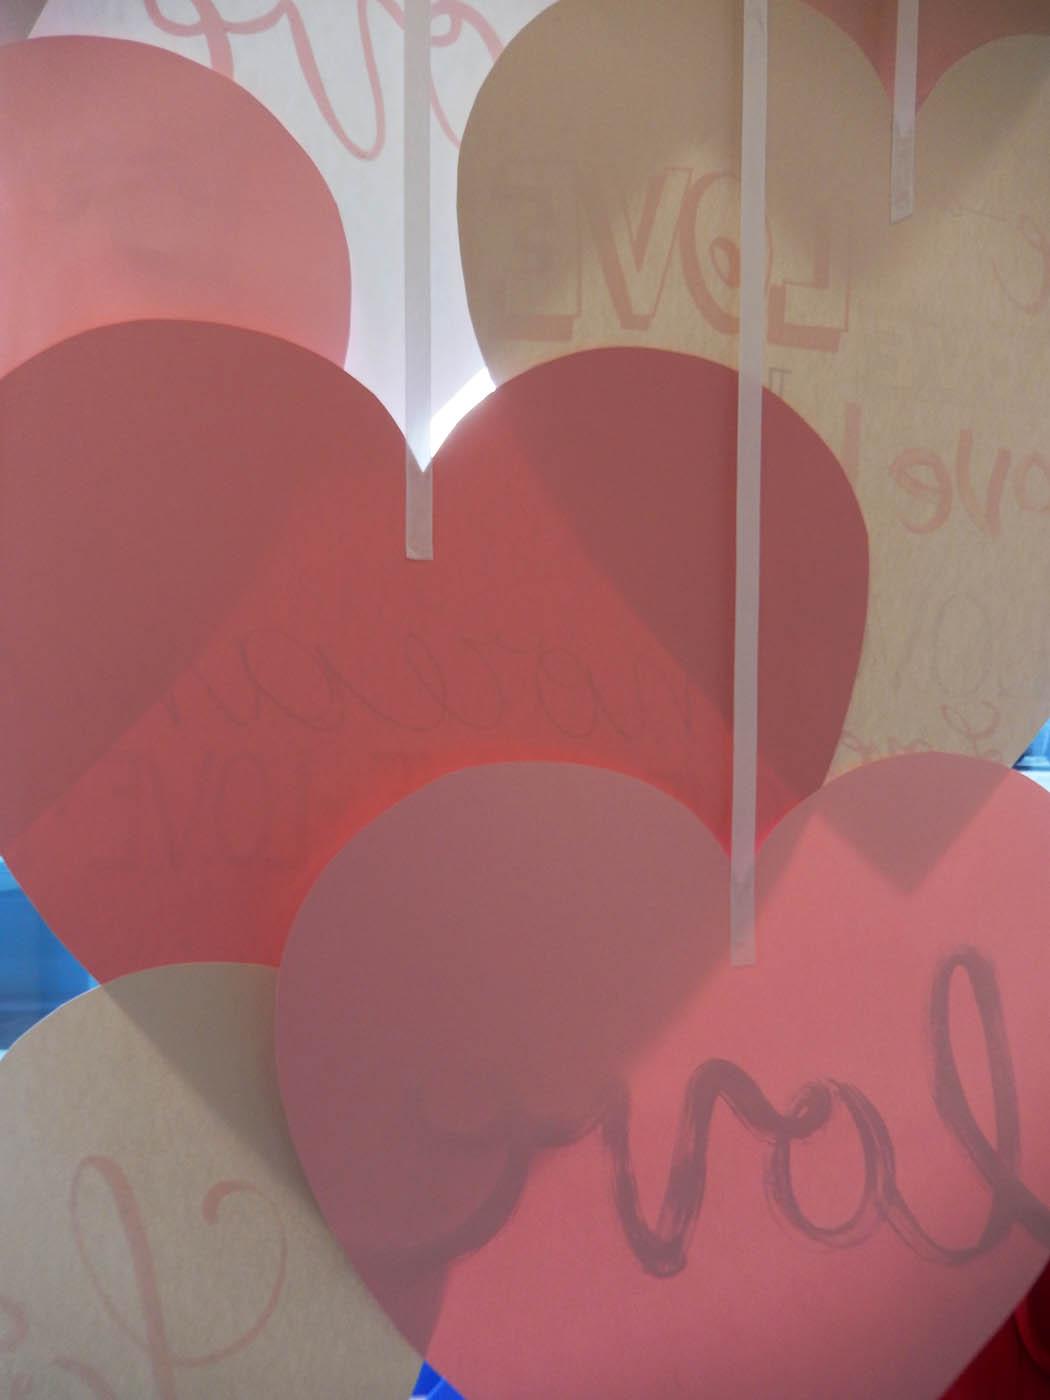 san-valentino-fabriano-wonderland-milano-vetrina-scultura-carta